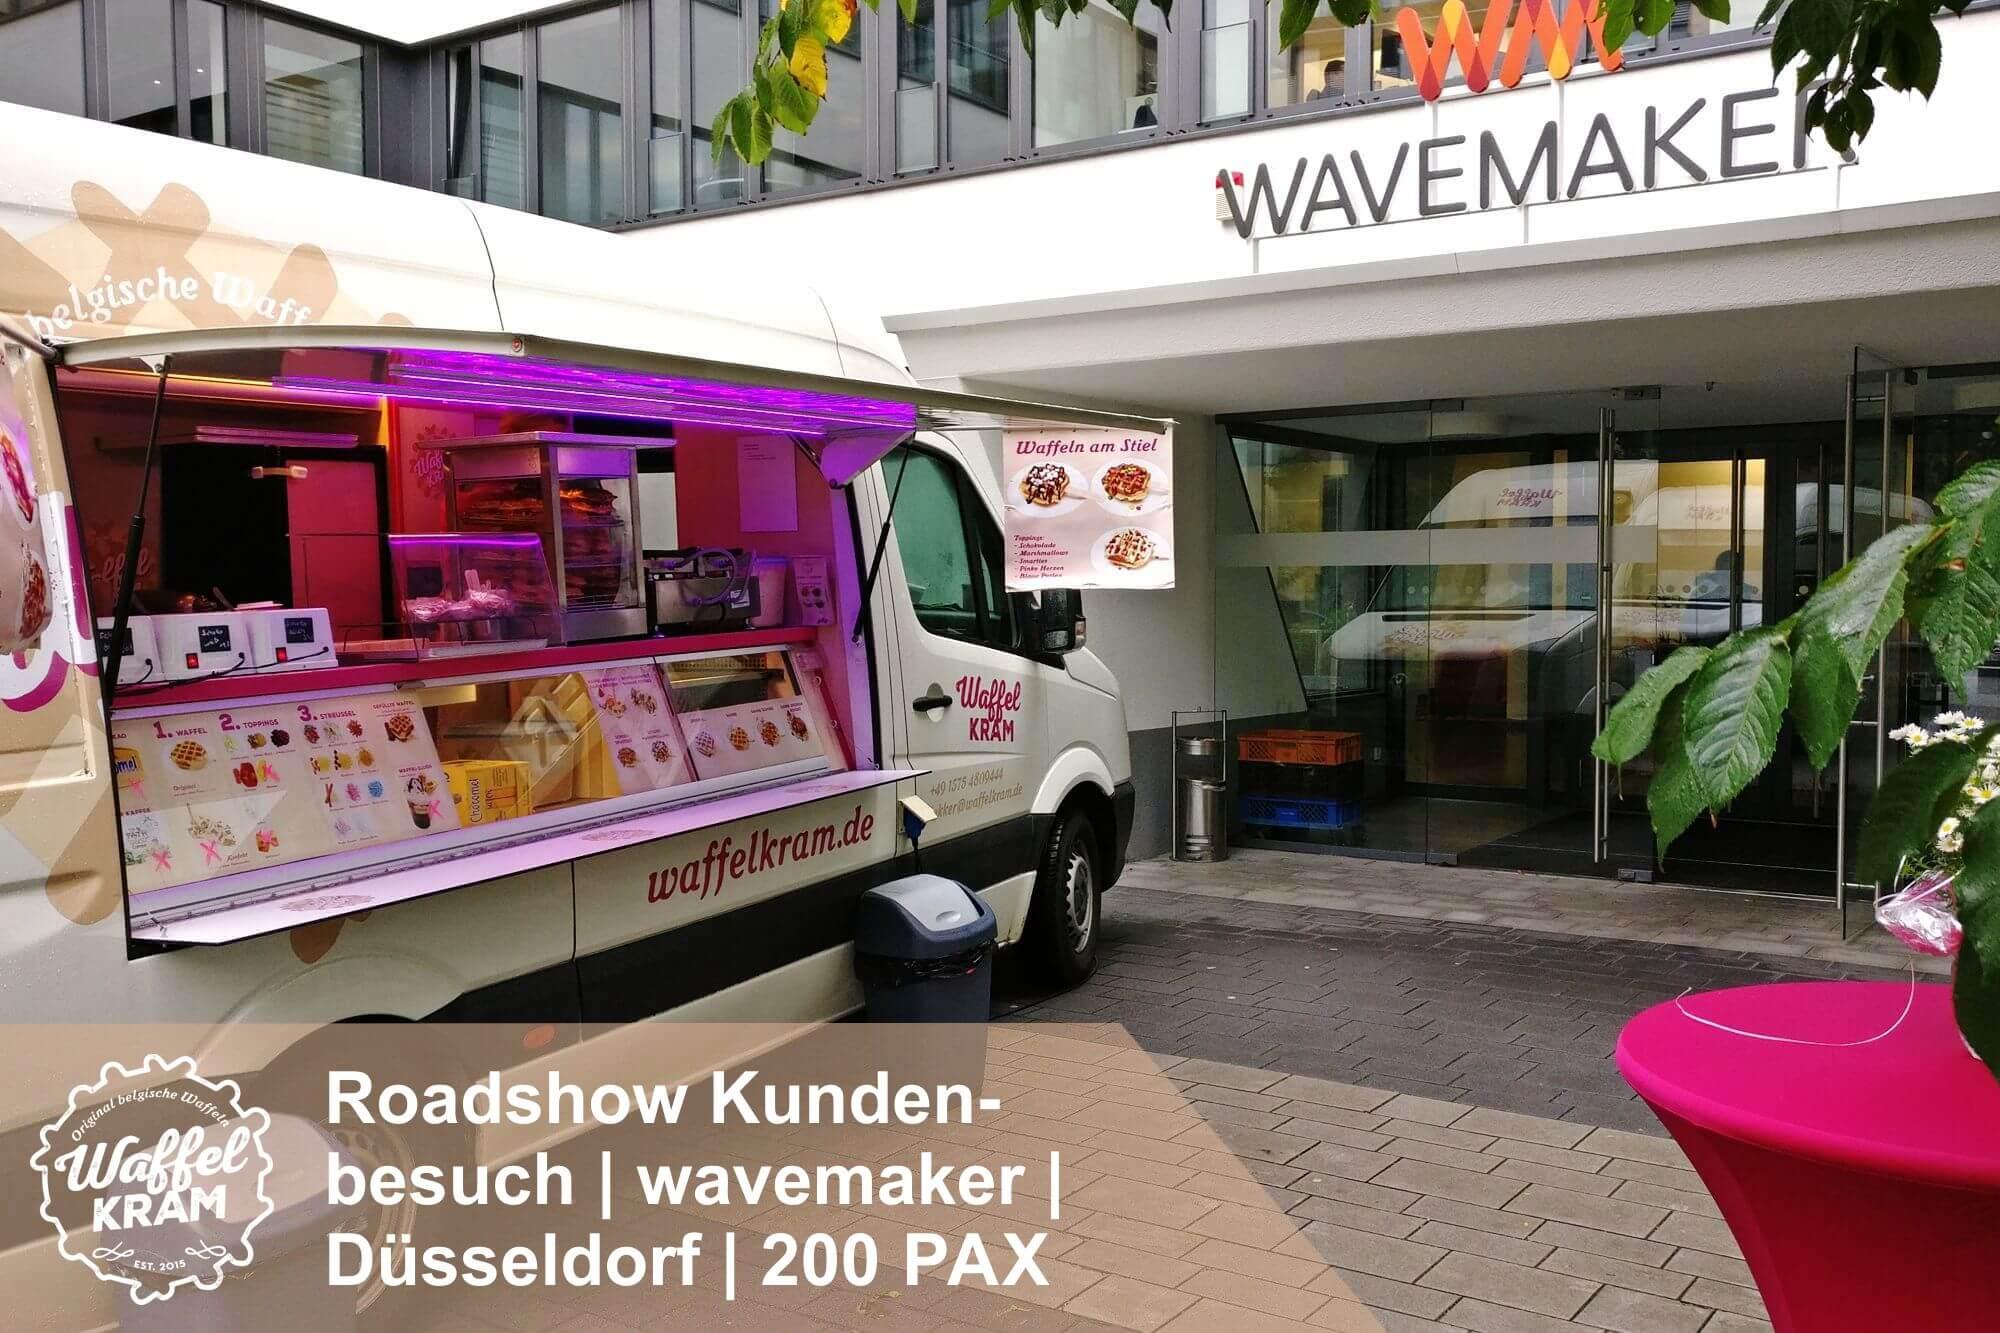 catering-roadshow-kundenbesuch-wavemaker-duesseldorf-tx